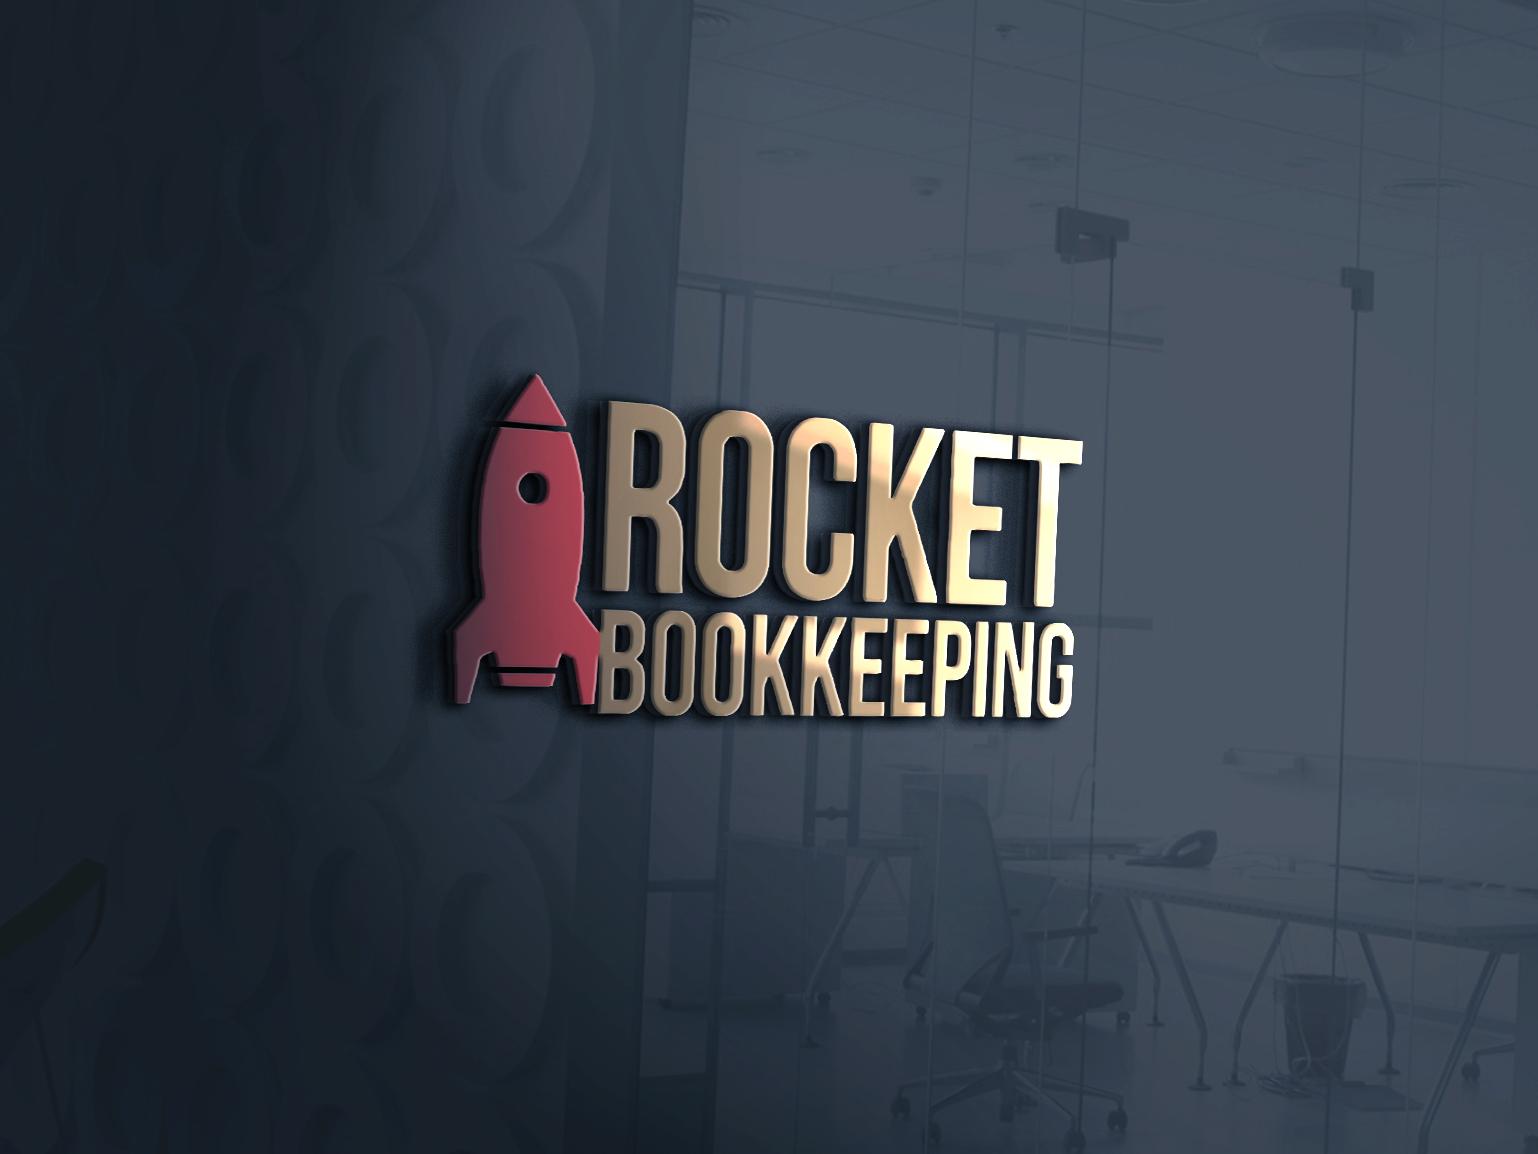 rocket bookkeeping logo typography logo unique logo creative logo rocket bookkeeping logo rocket logo